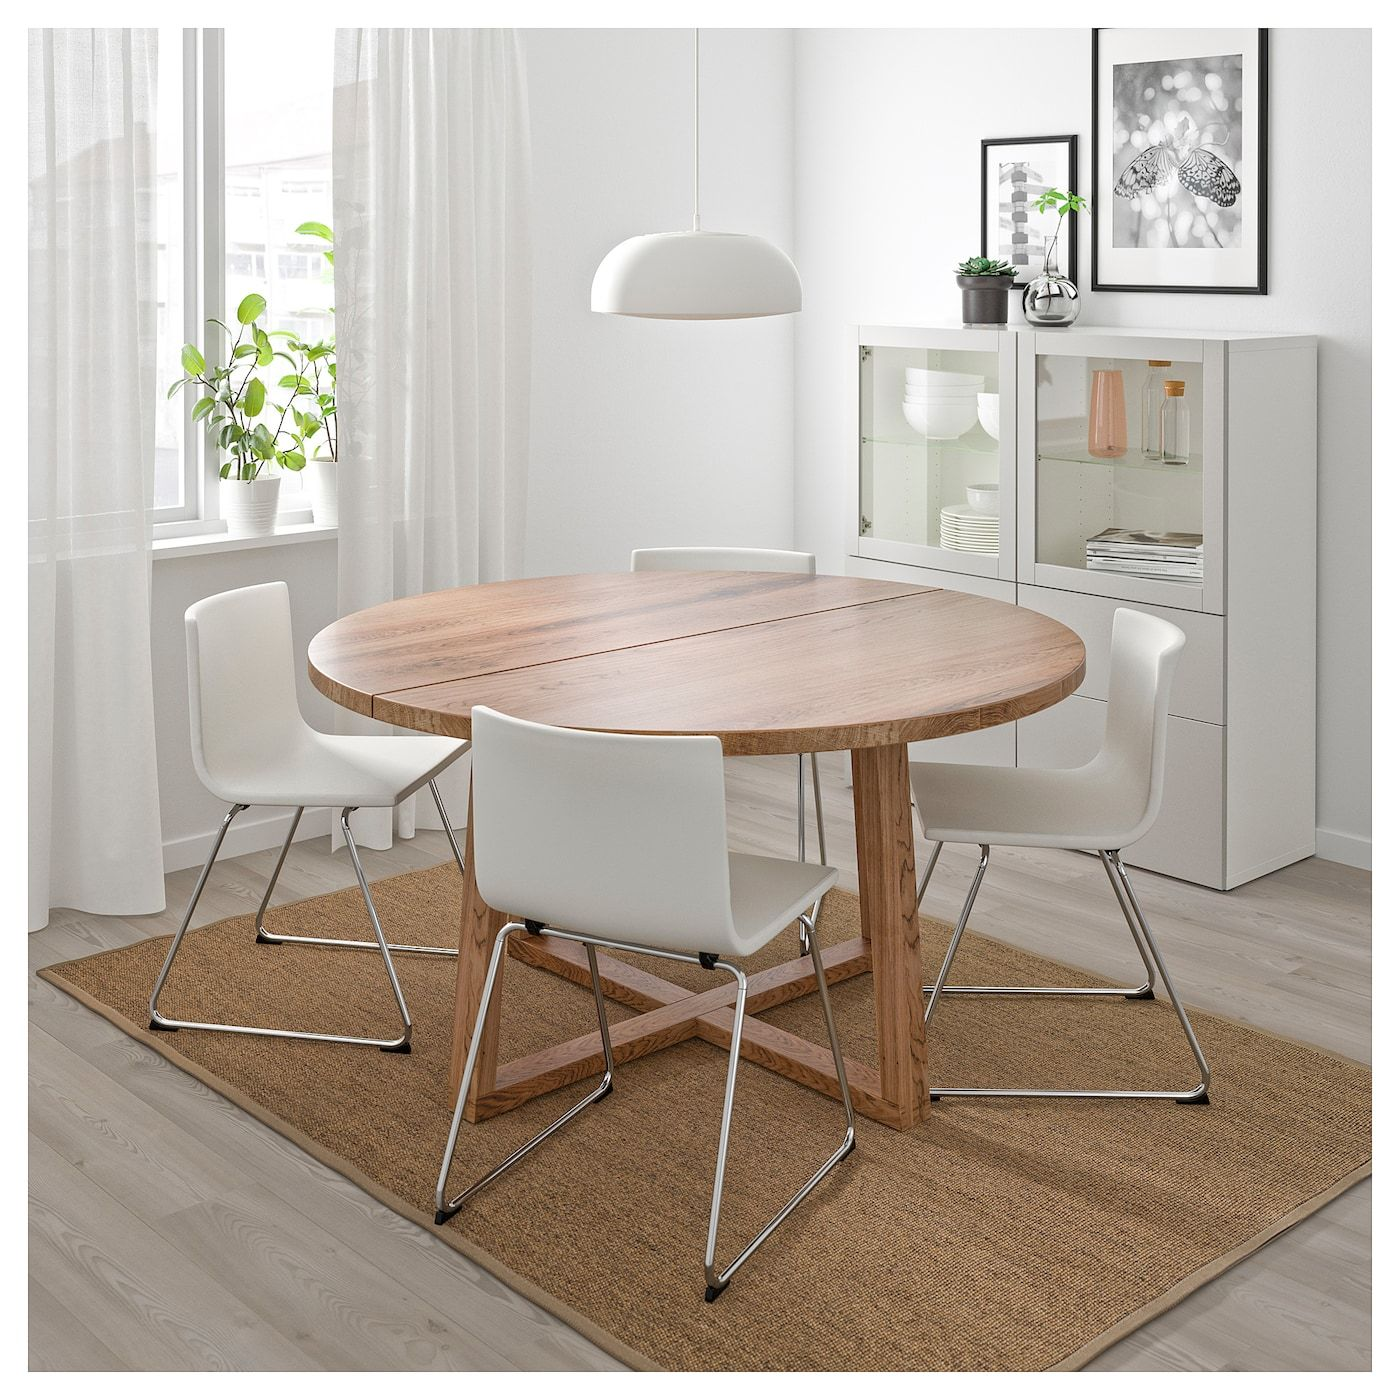 Morbylanga Table Oak Veneer Brown Stained 57 1 8 Ikea